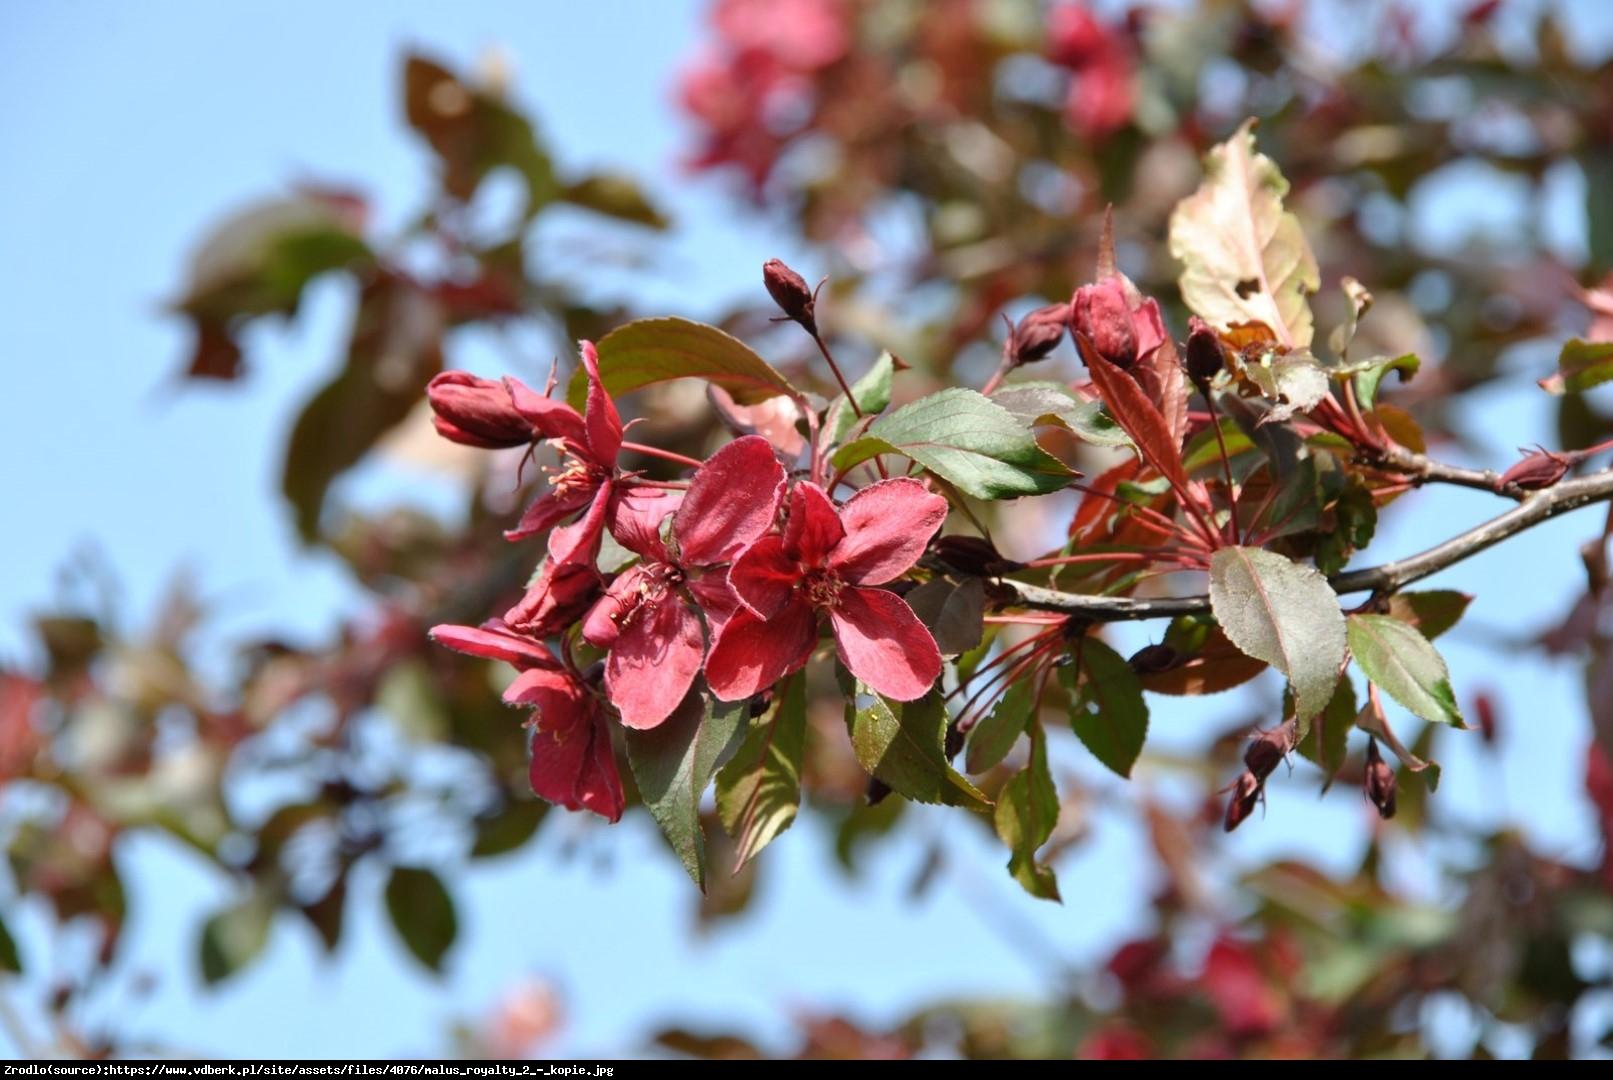 Jabłoń Royalty - Malus Royalty